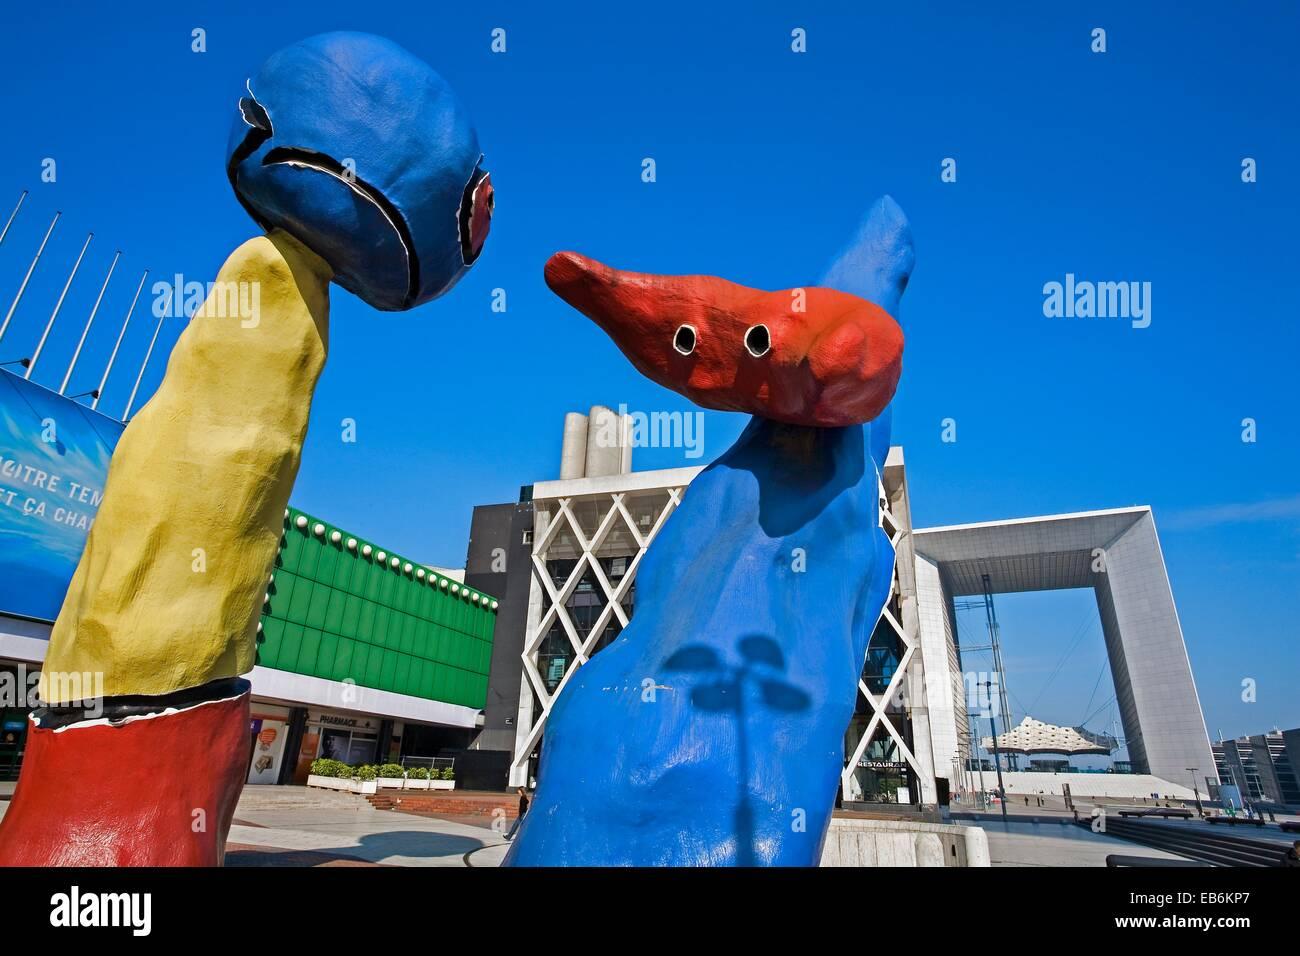 c8.alamy.com/comp/EB6KP7/joan-miro-sculpture-great...